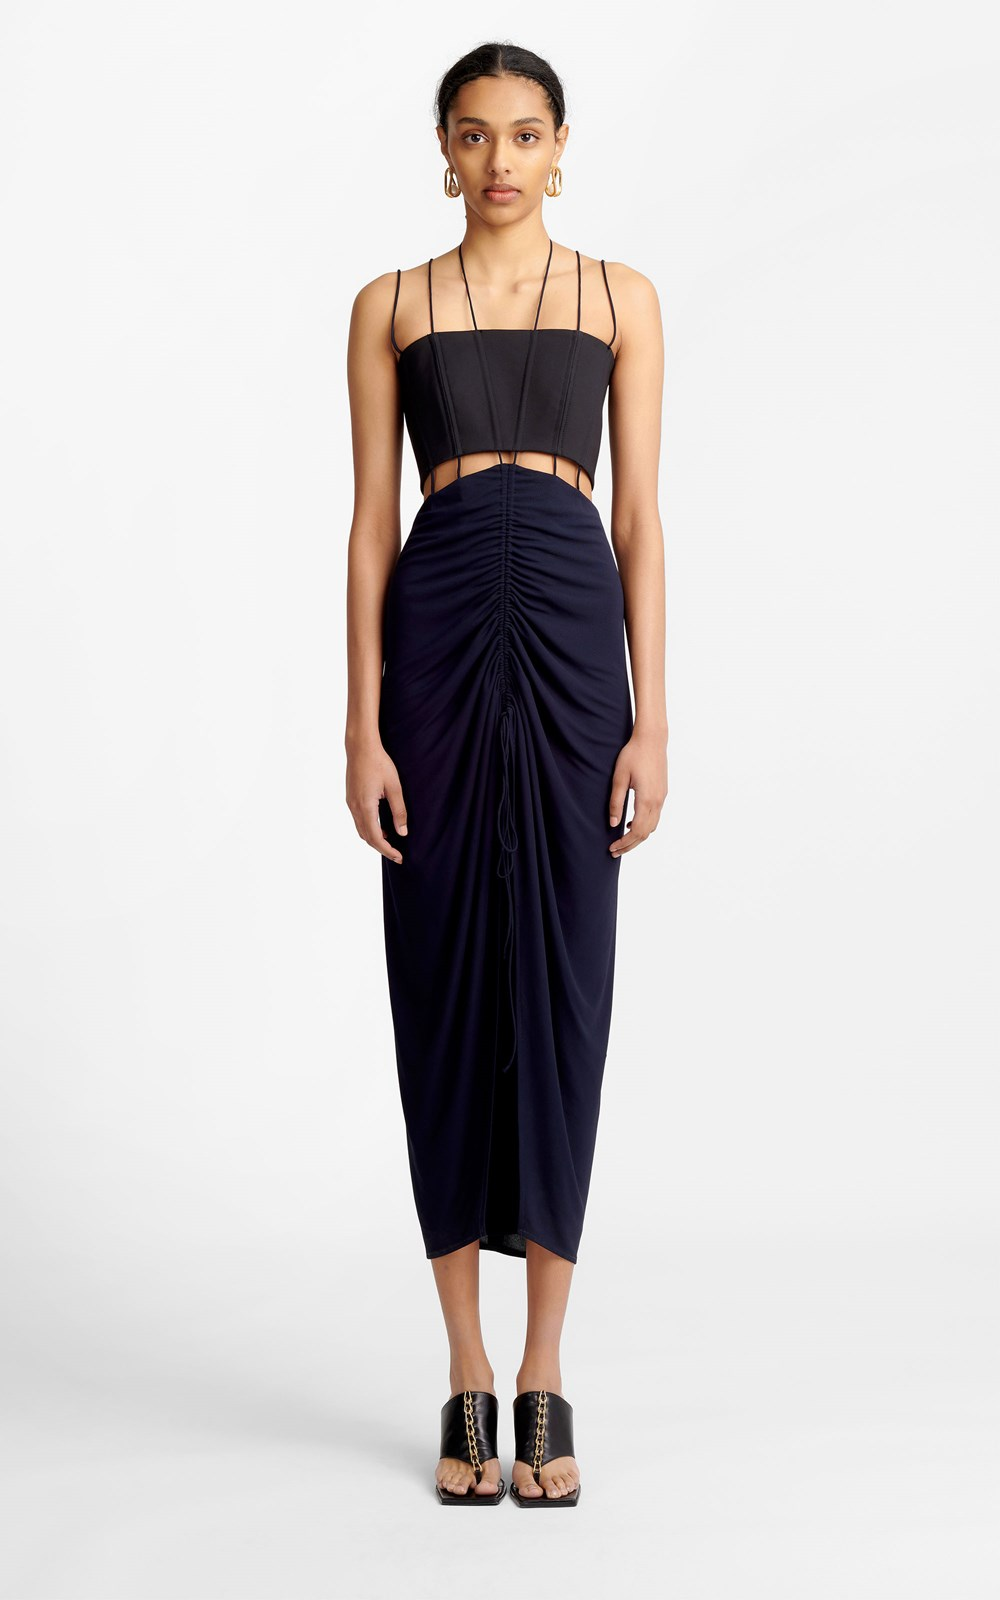 New  | ROULEAU SUSPEND DRESS